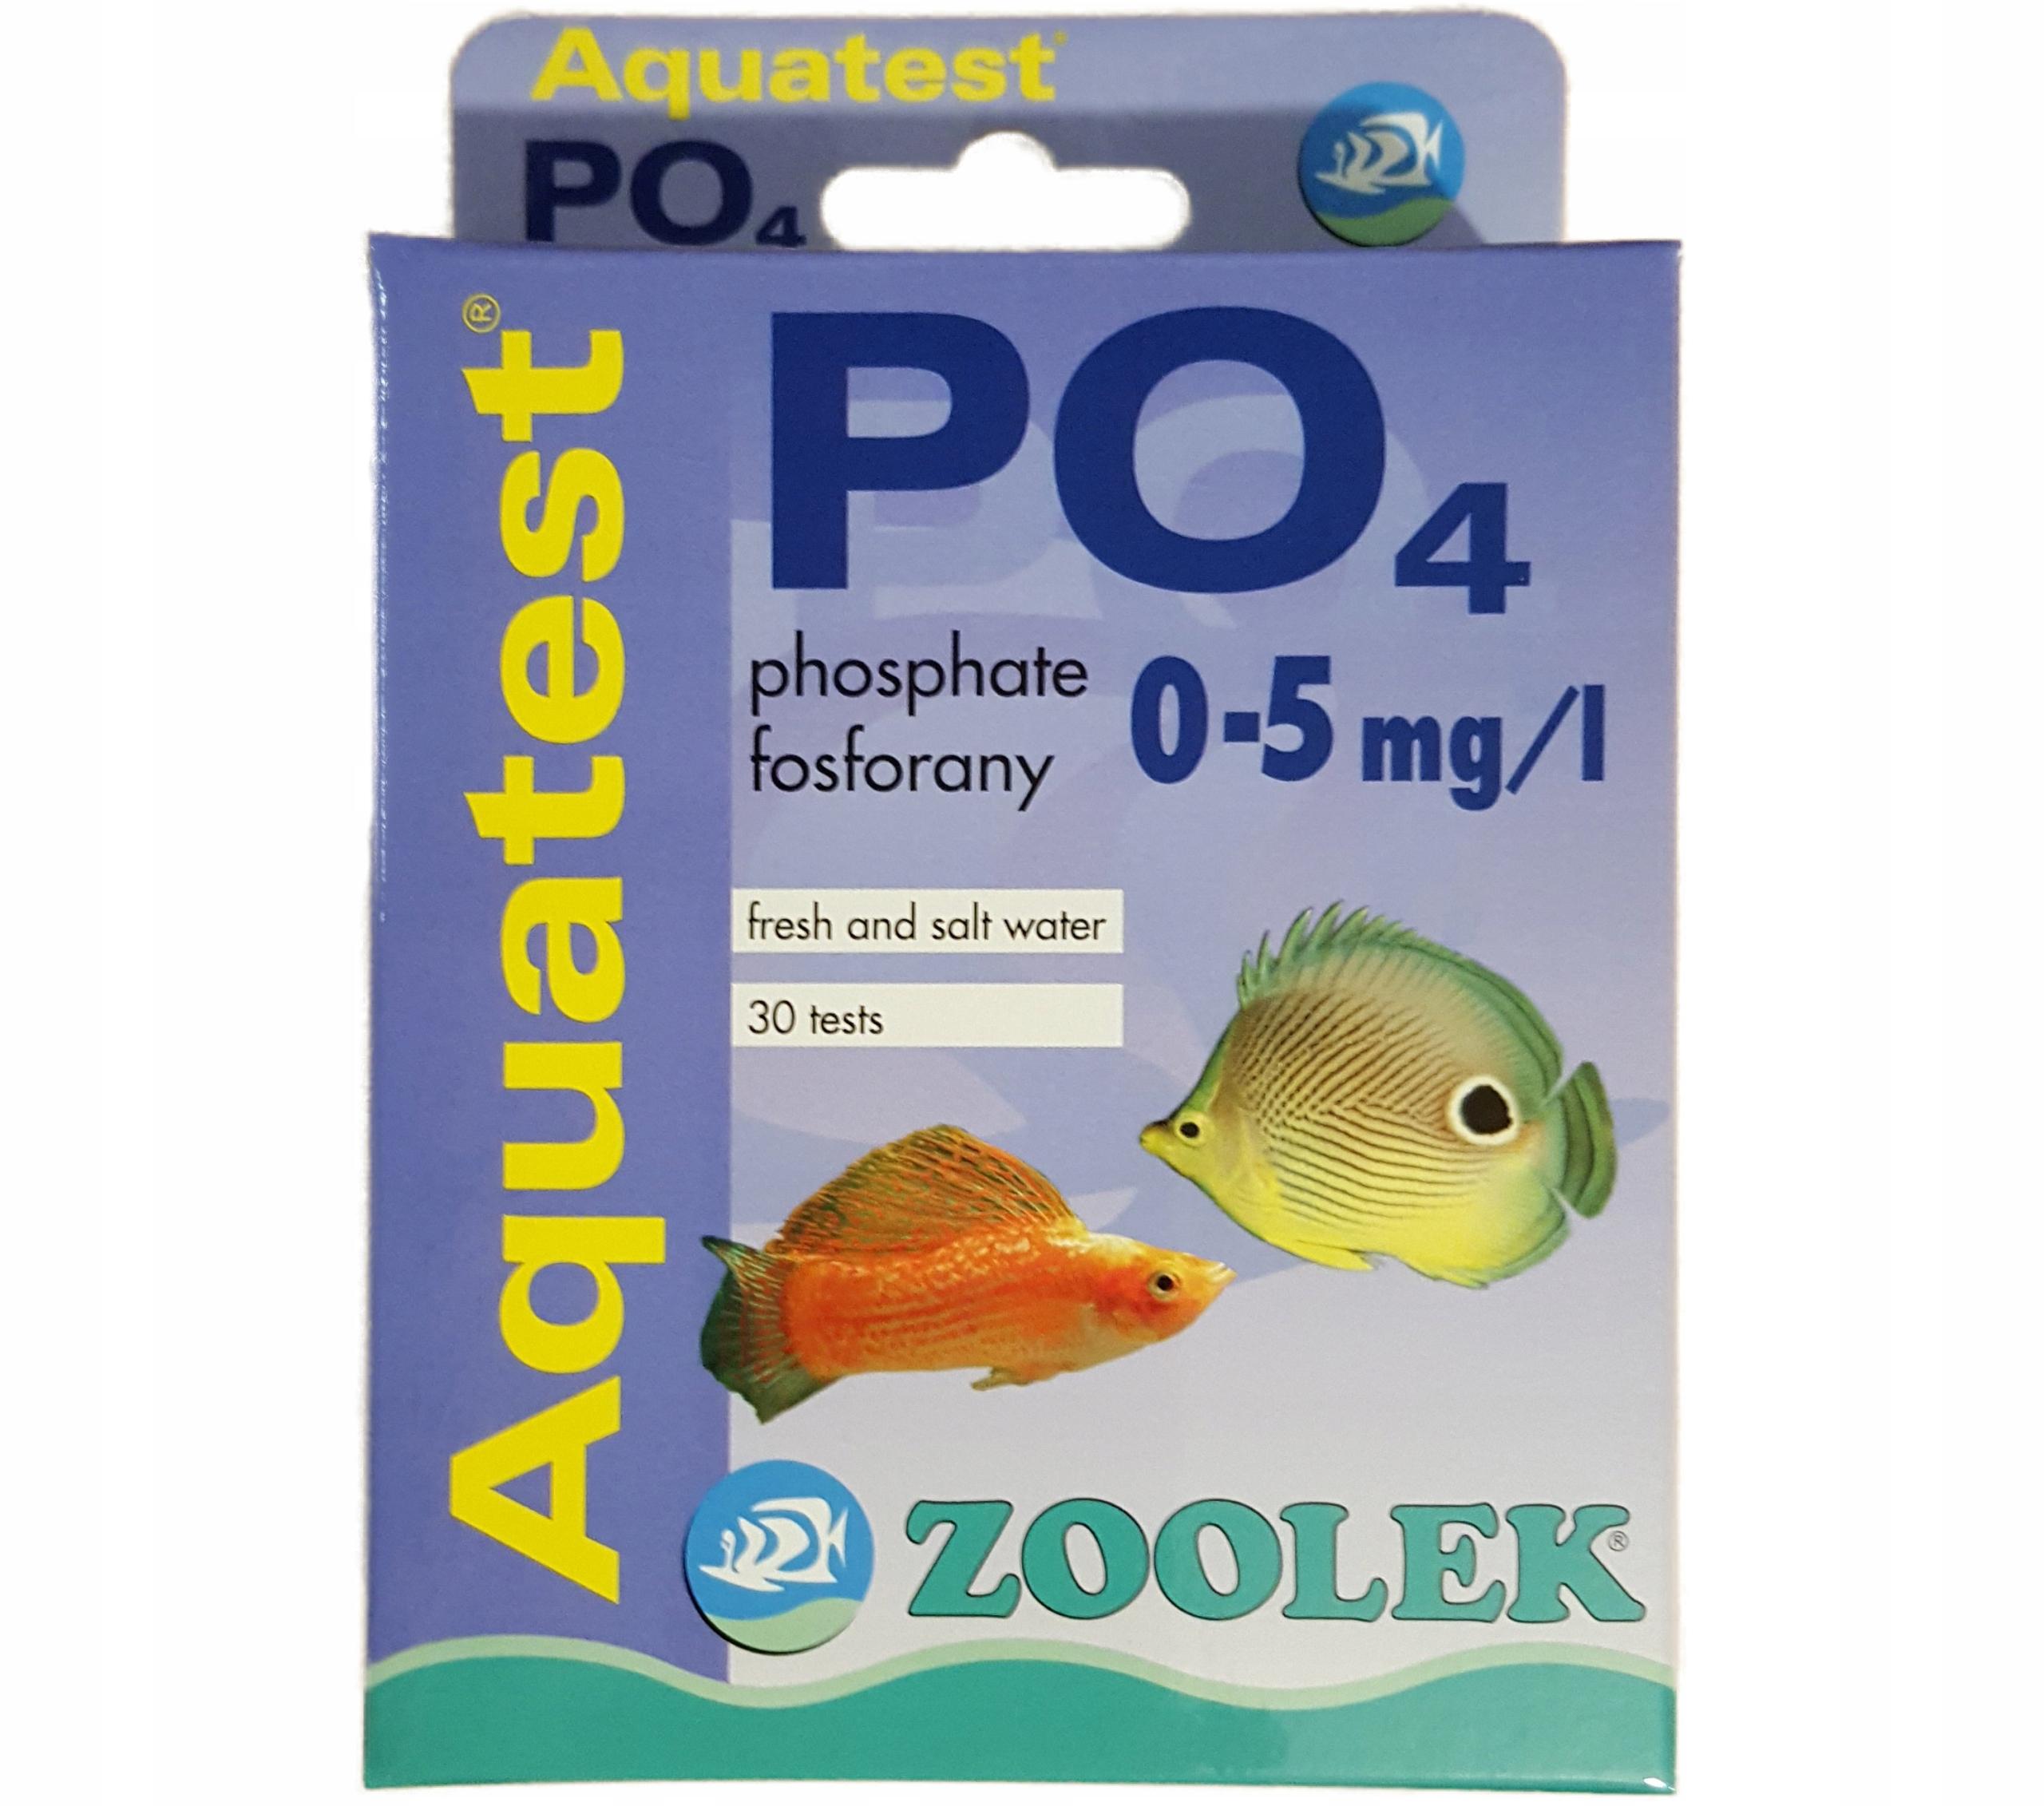 Тест для измерения PO4 фосфатов лекарство Aquatest